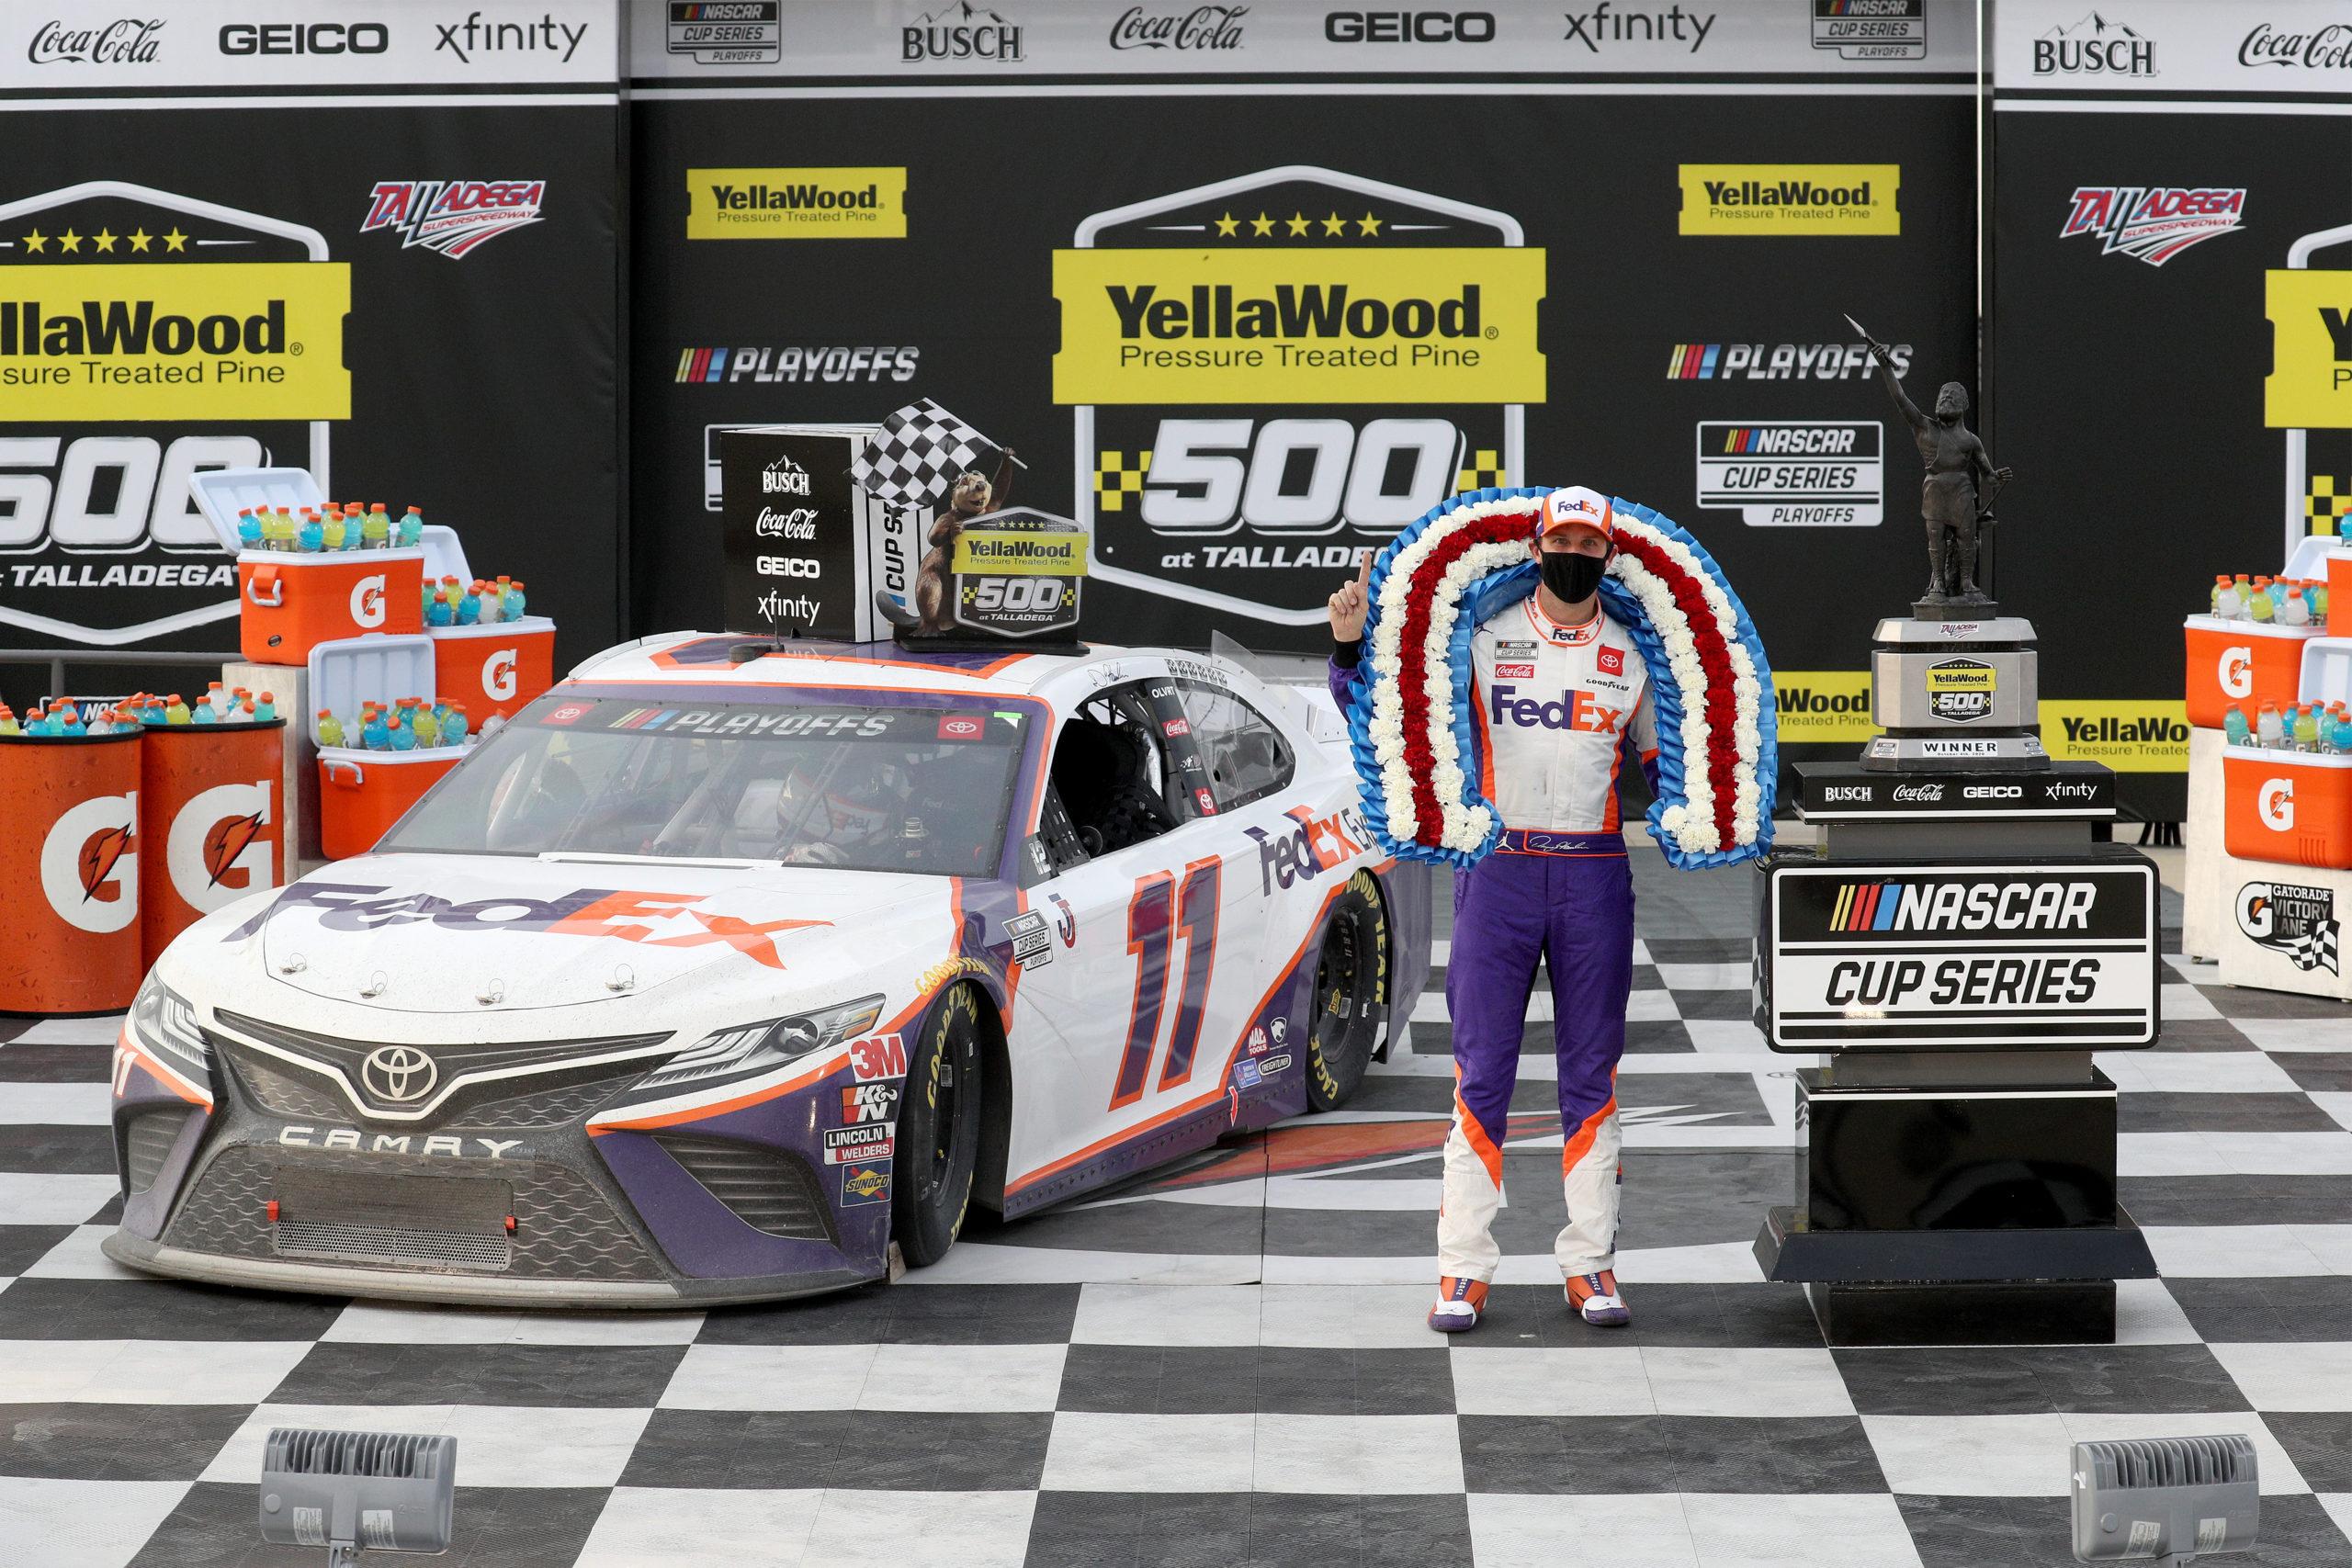 Foto de NASCAR Cup Series: Com manobra polêmica, Denny Hamlin fatura a conturbada prova de Talladega